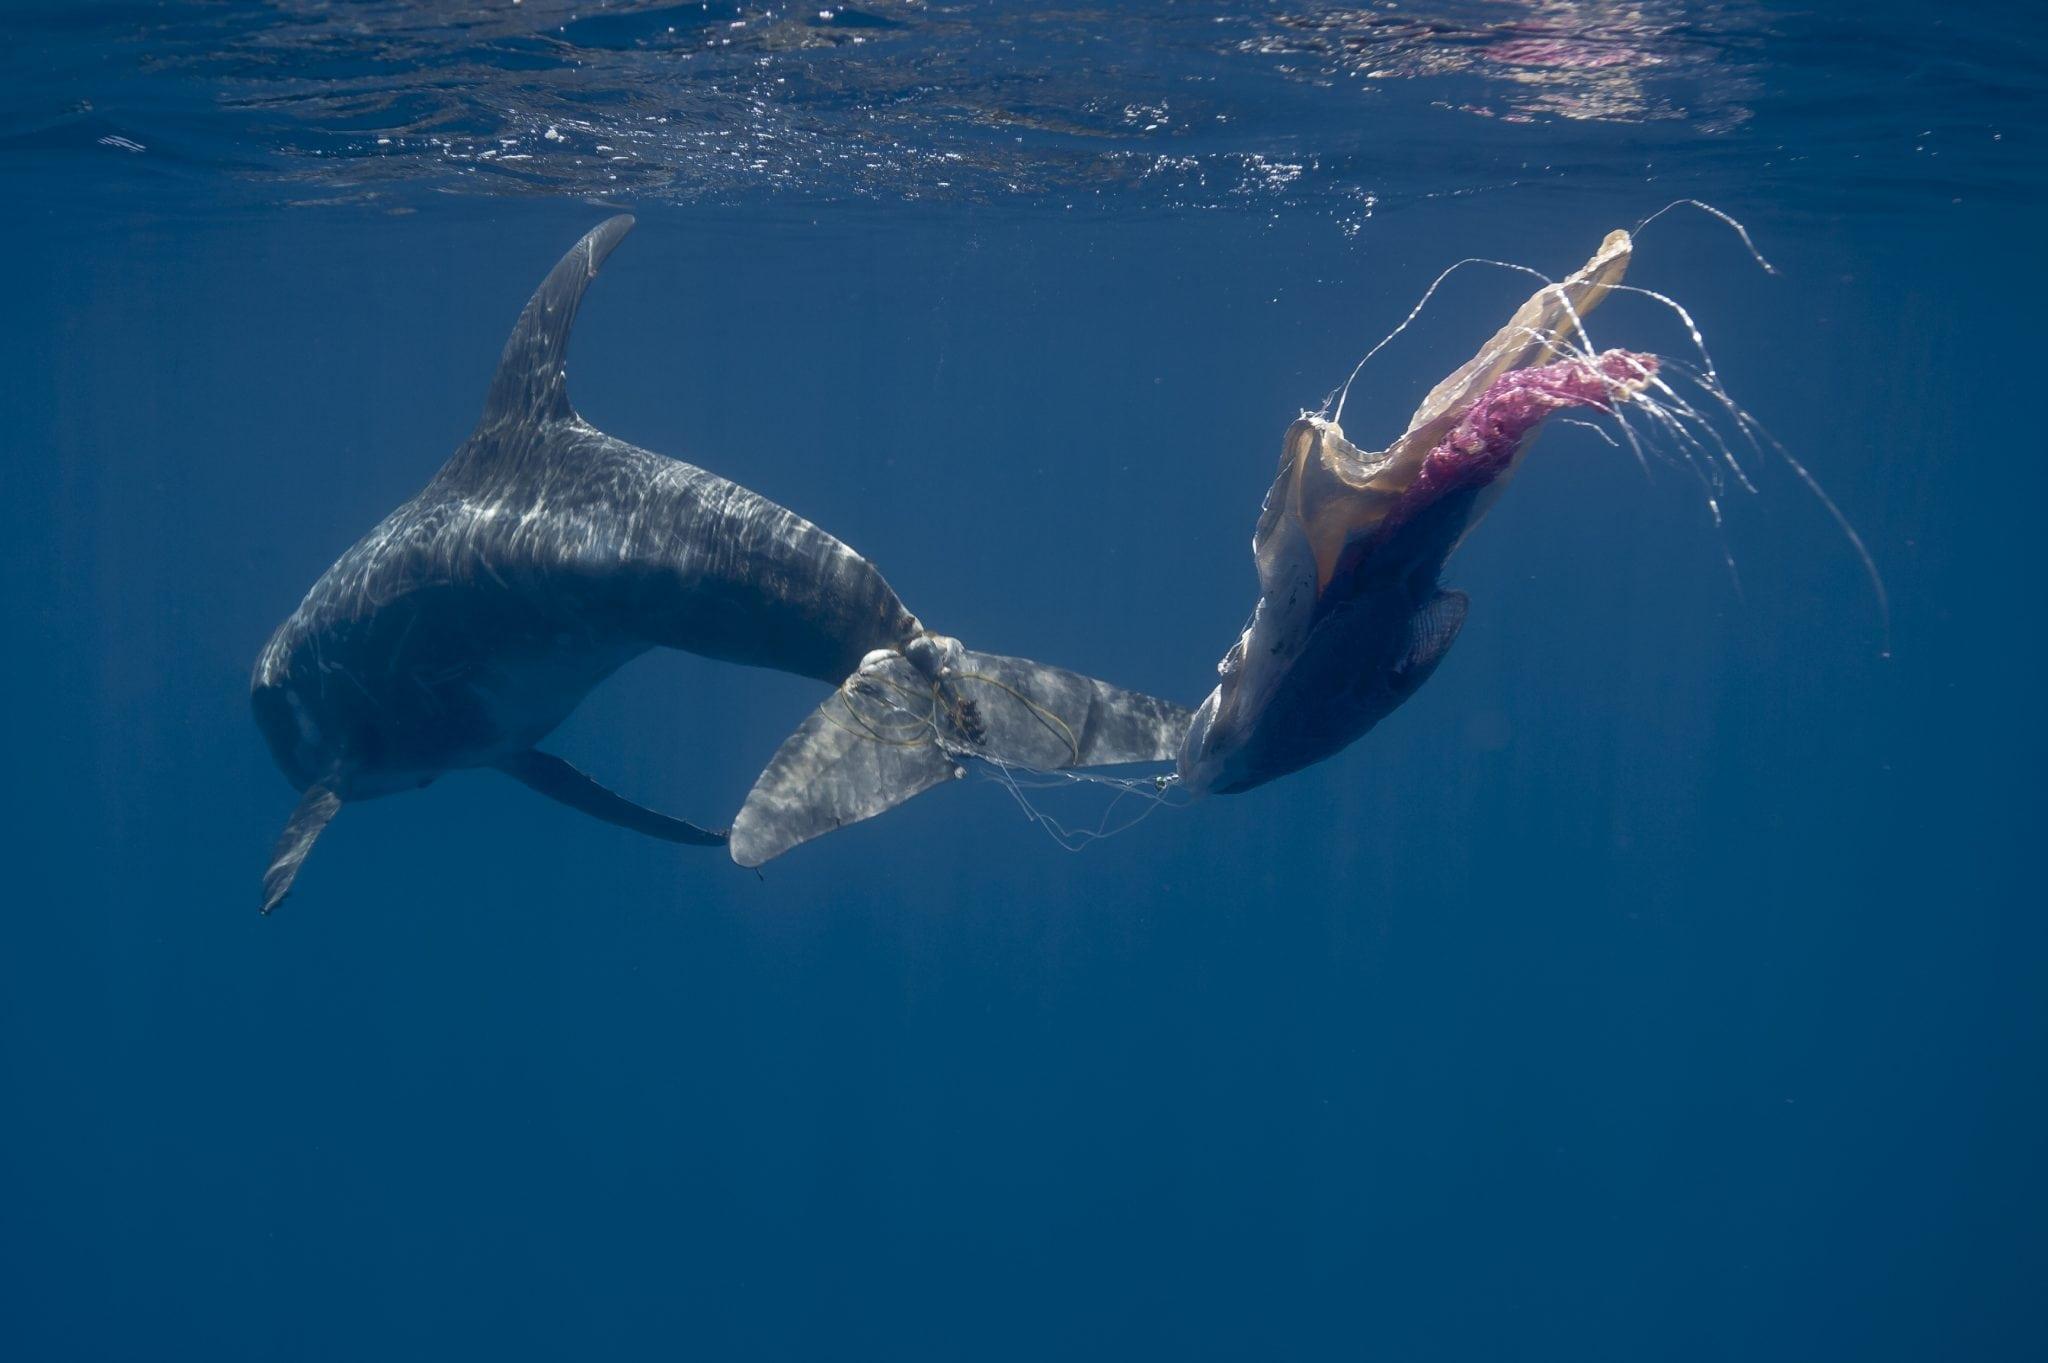 Sri Lanka Rundkopfdelfin Plastik